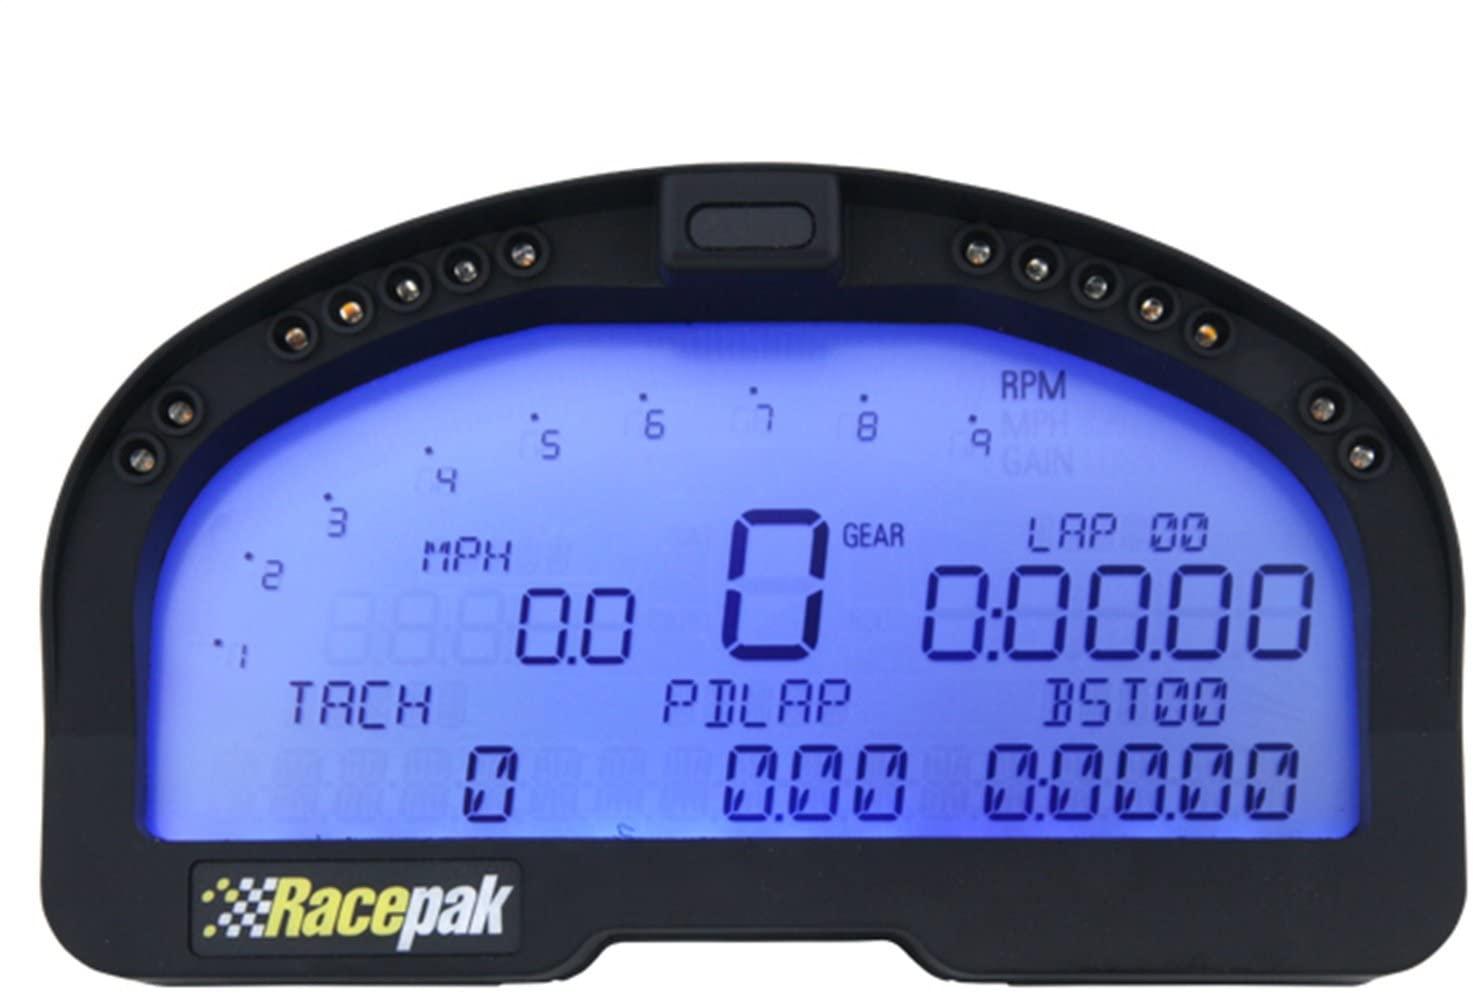 Racepak 250-DS-IQ3 Racepak , Iq3 Display Dash